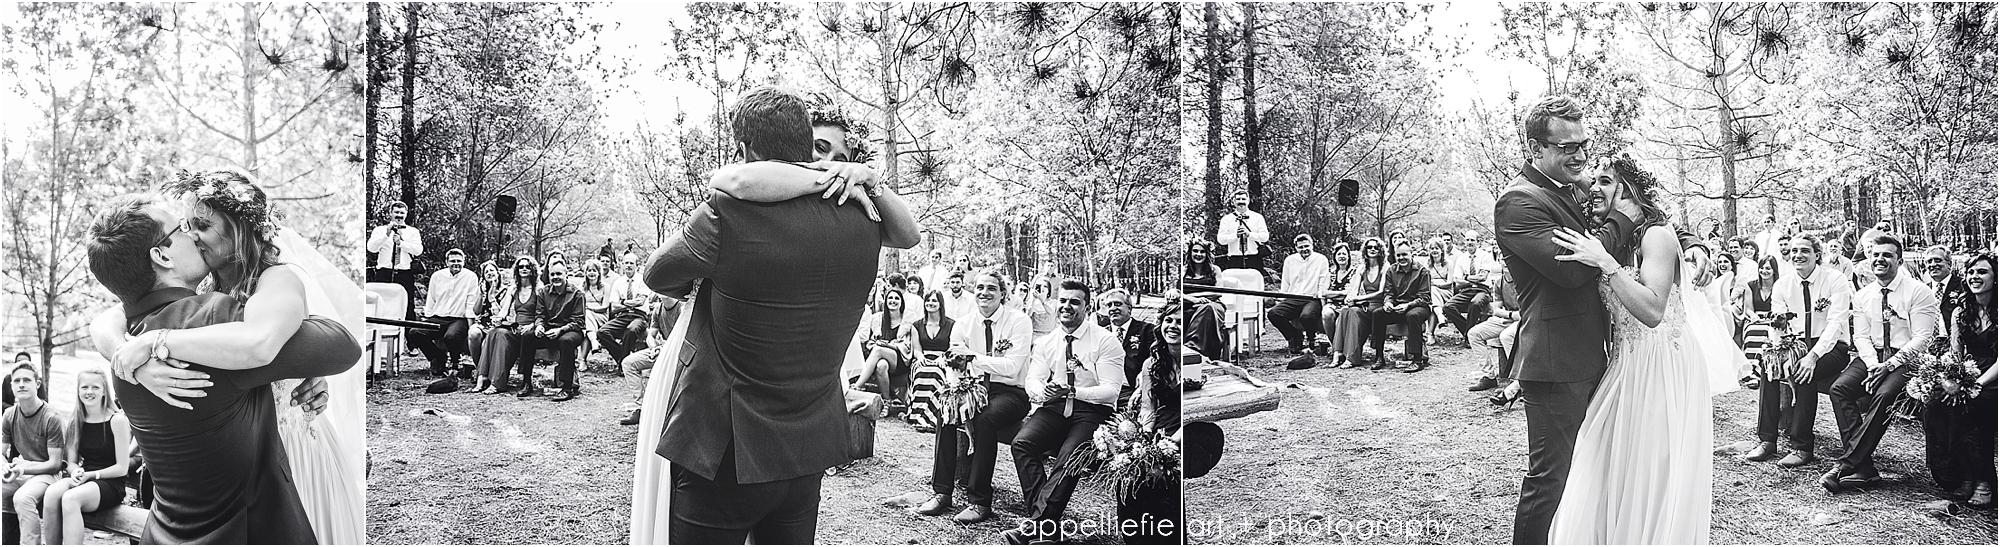 Thulani_Pretoria_Wedding_Appelliefie_FineART_Photographer ...